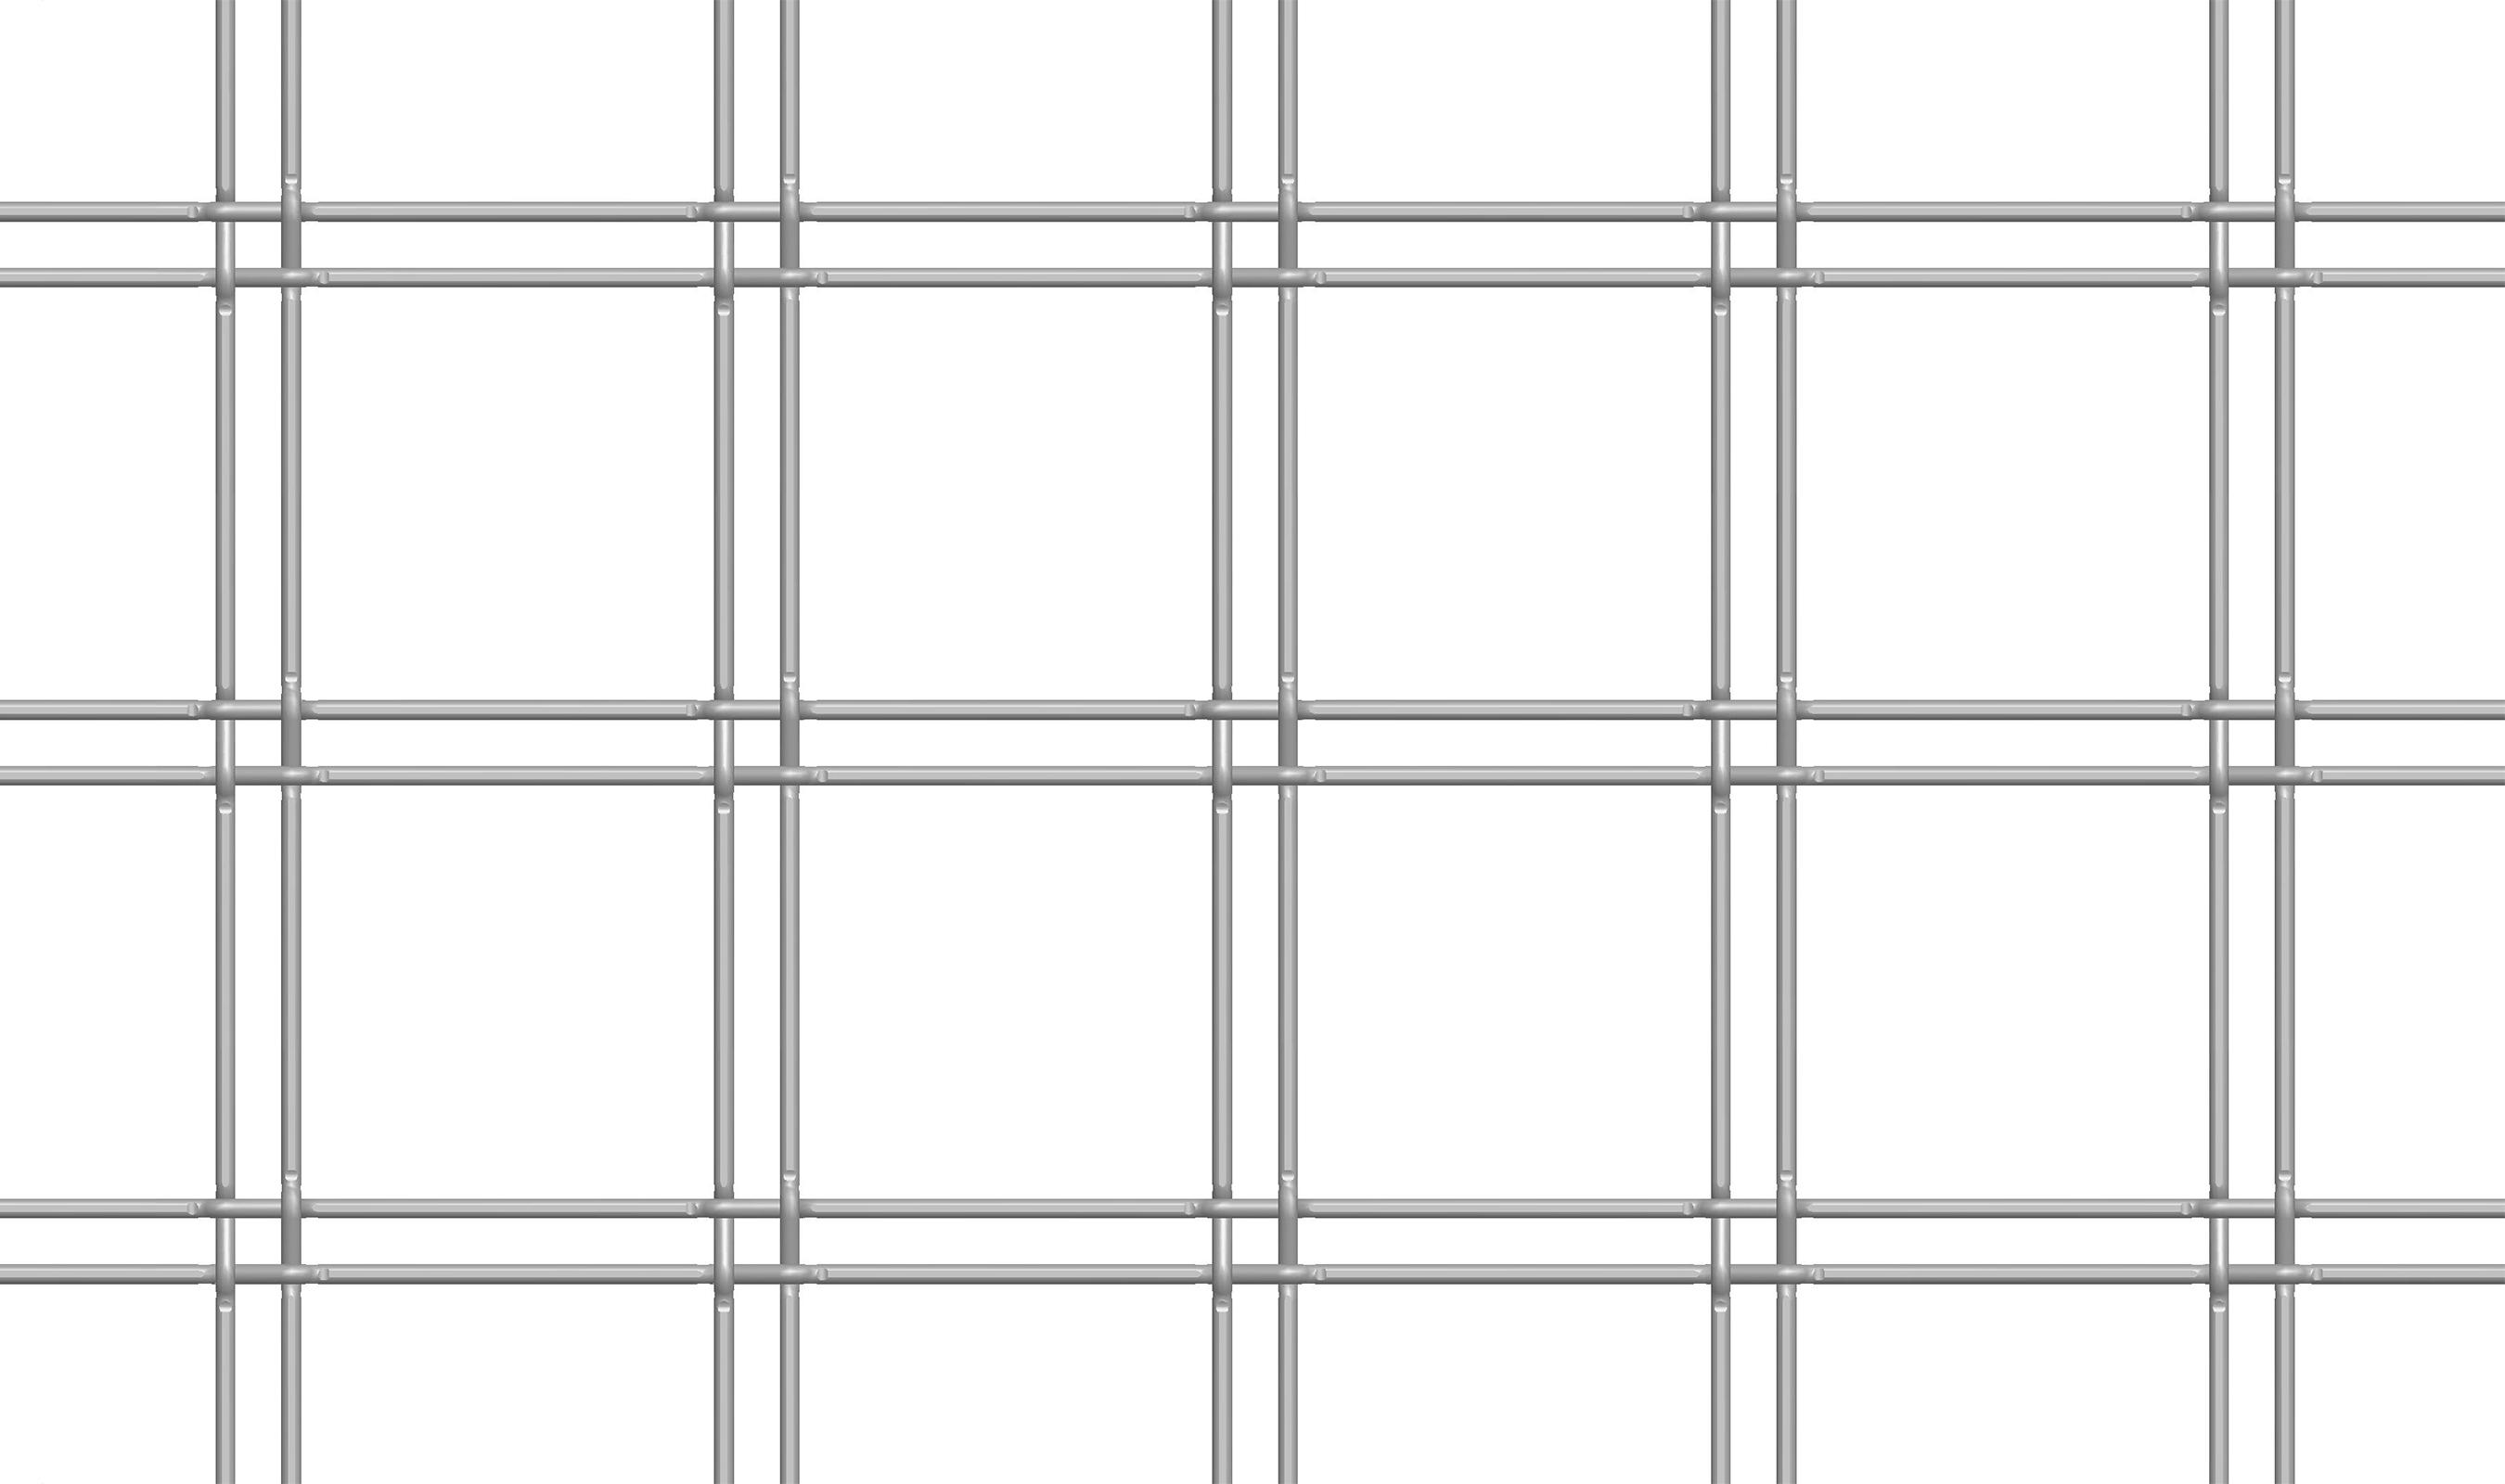 M22-34 woven wire mesh pattern